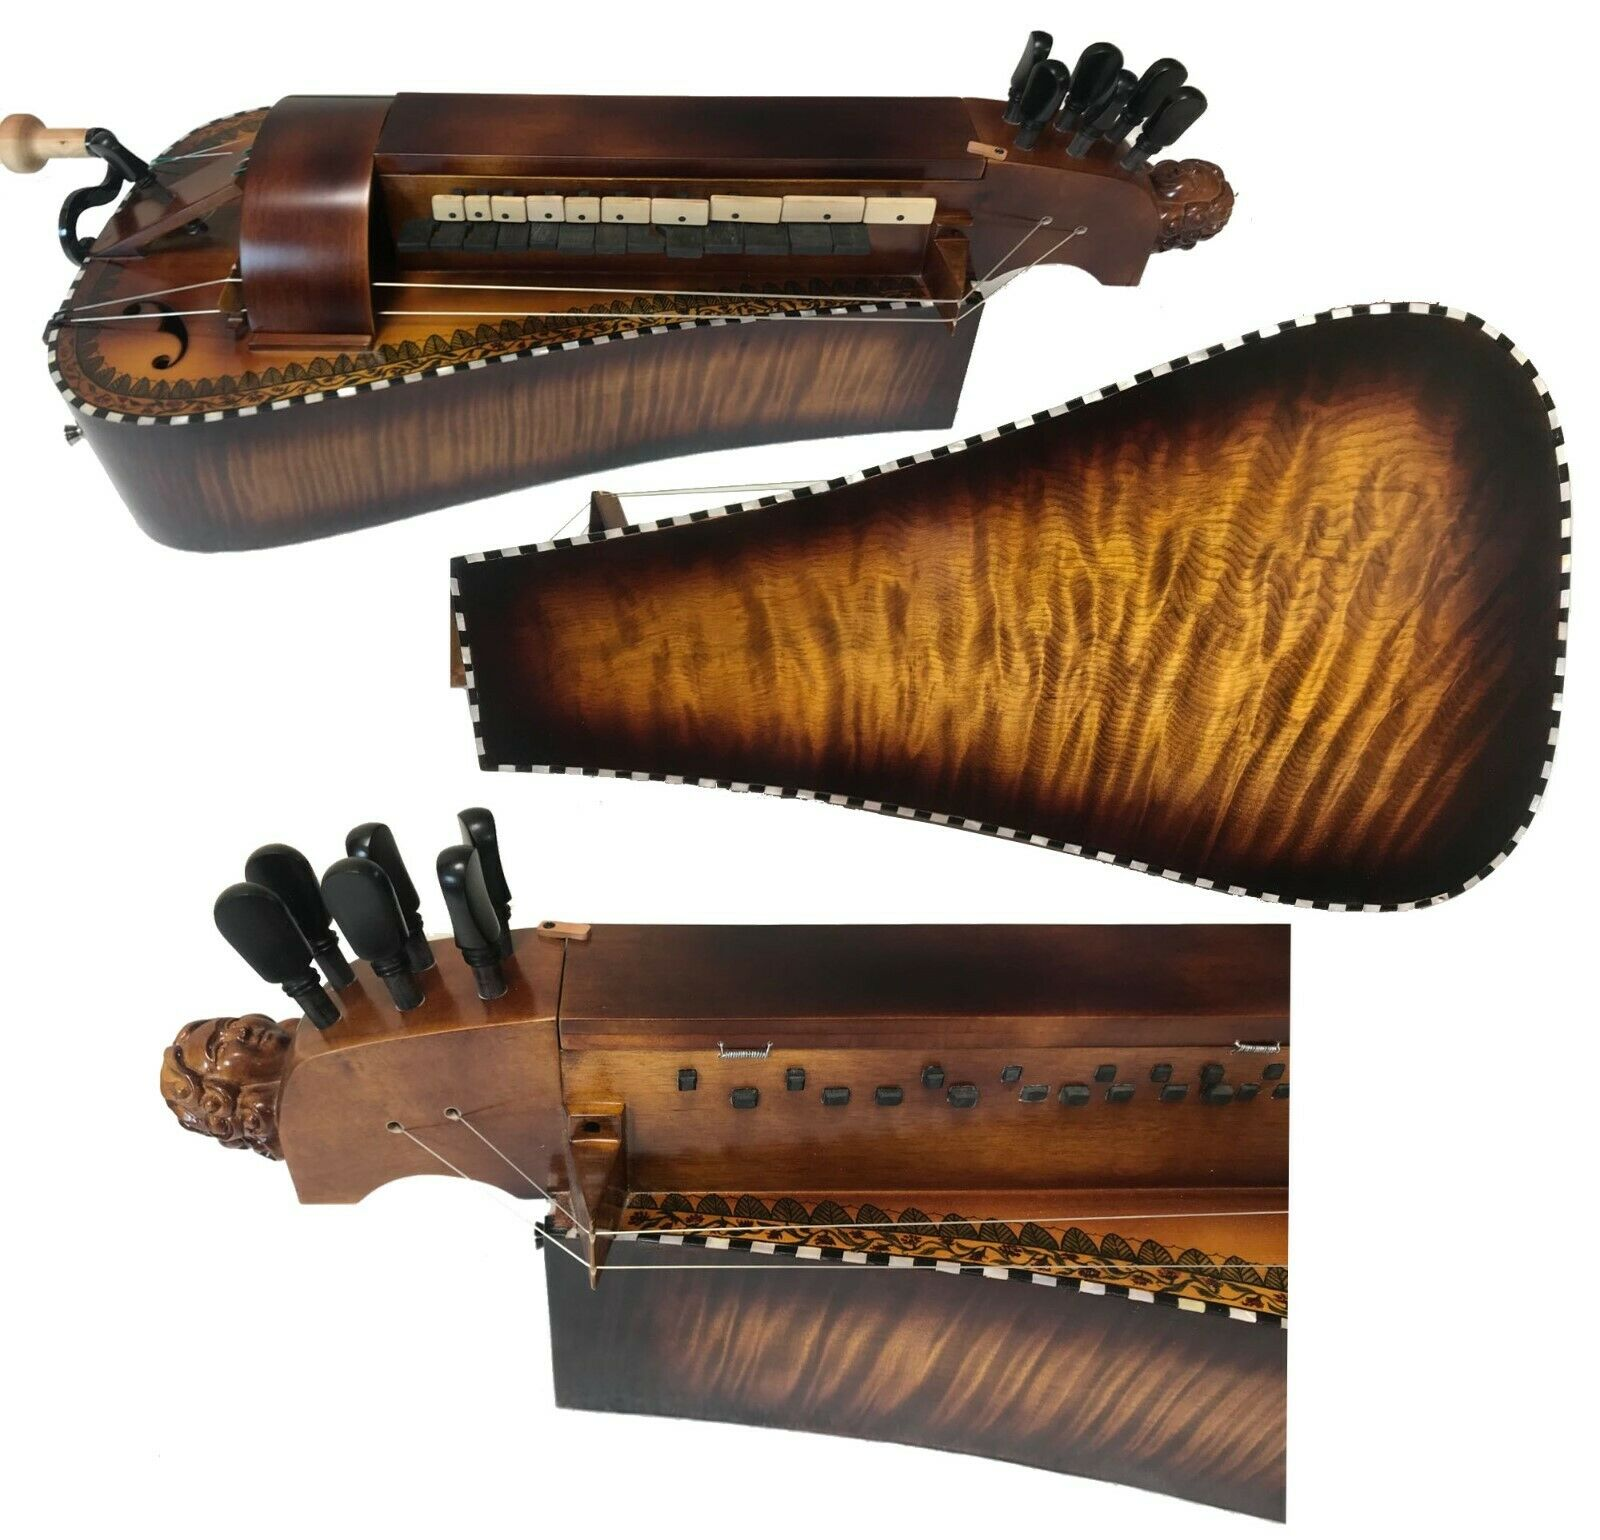 Carcasa con incrustación de madera de arce para mujer, accesorio de 6...